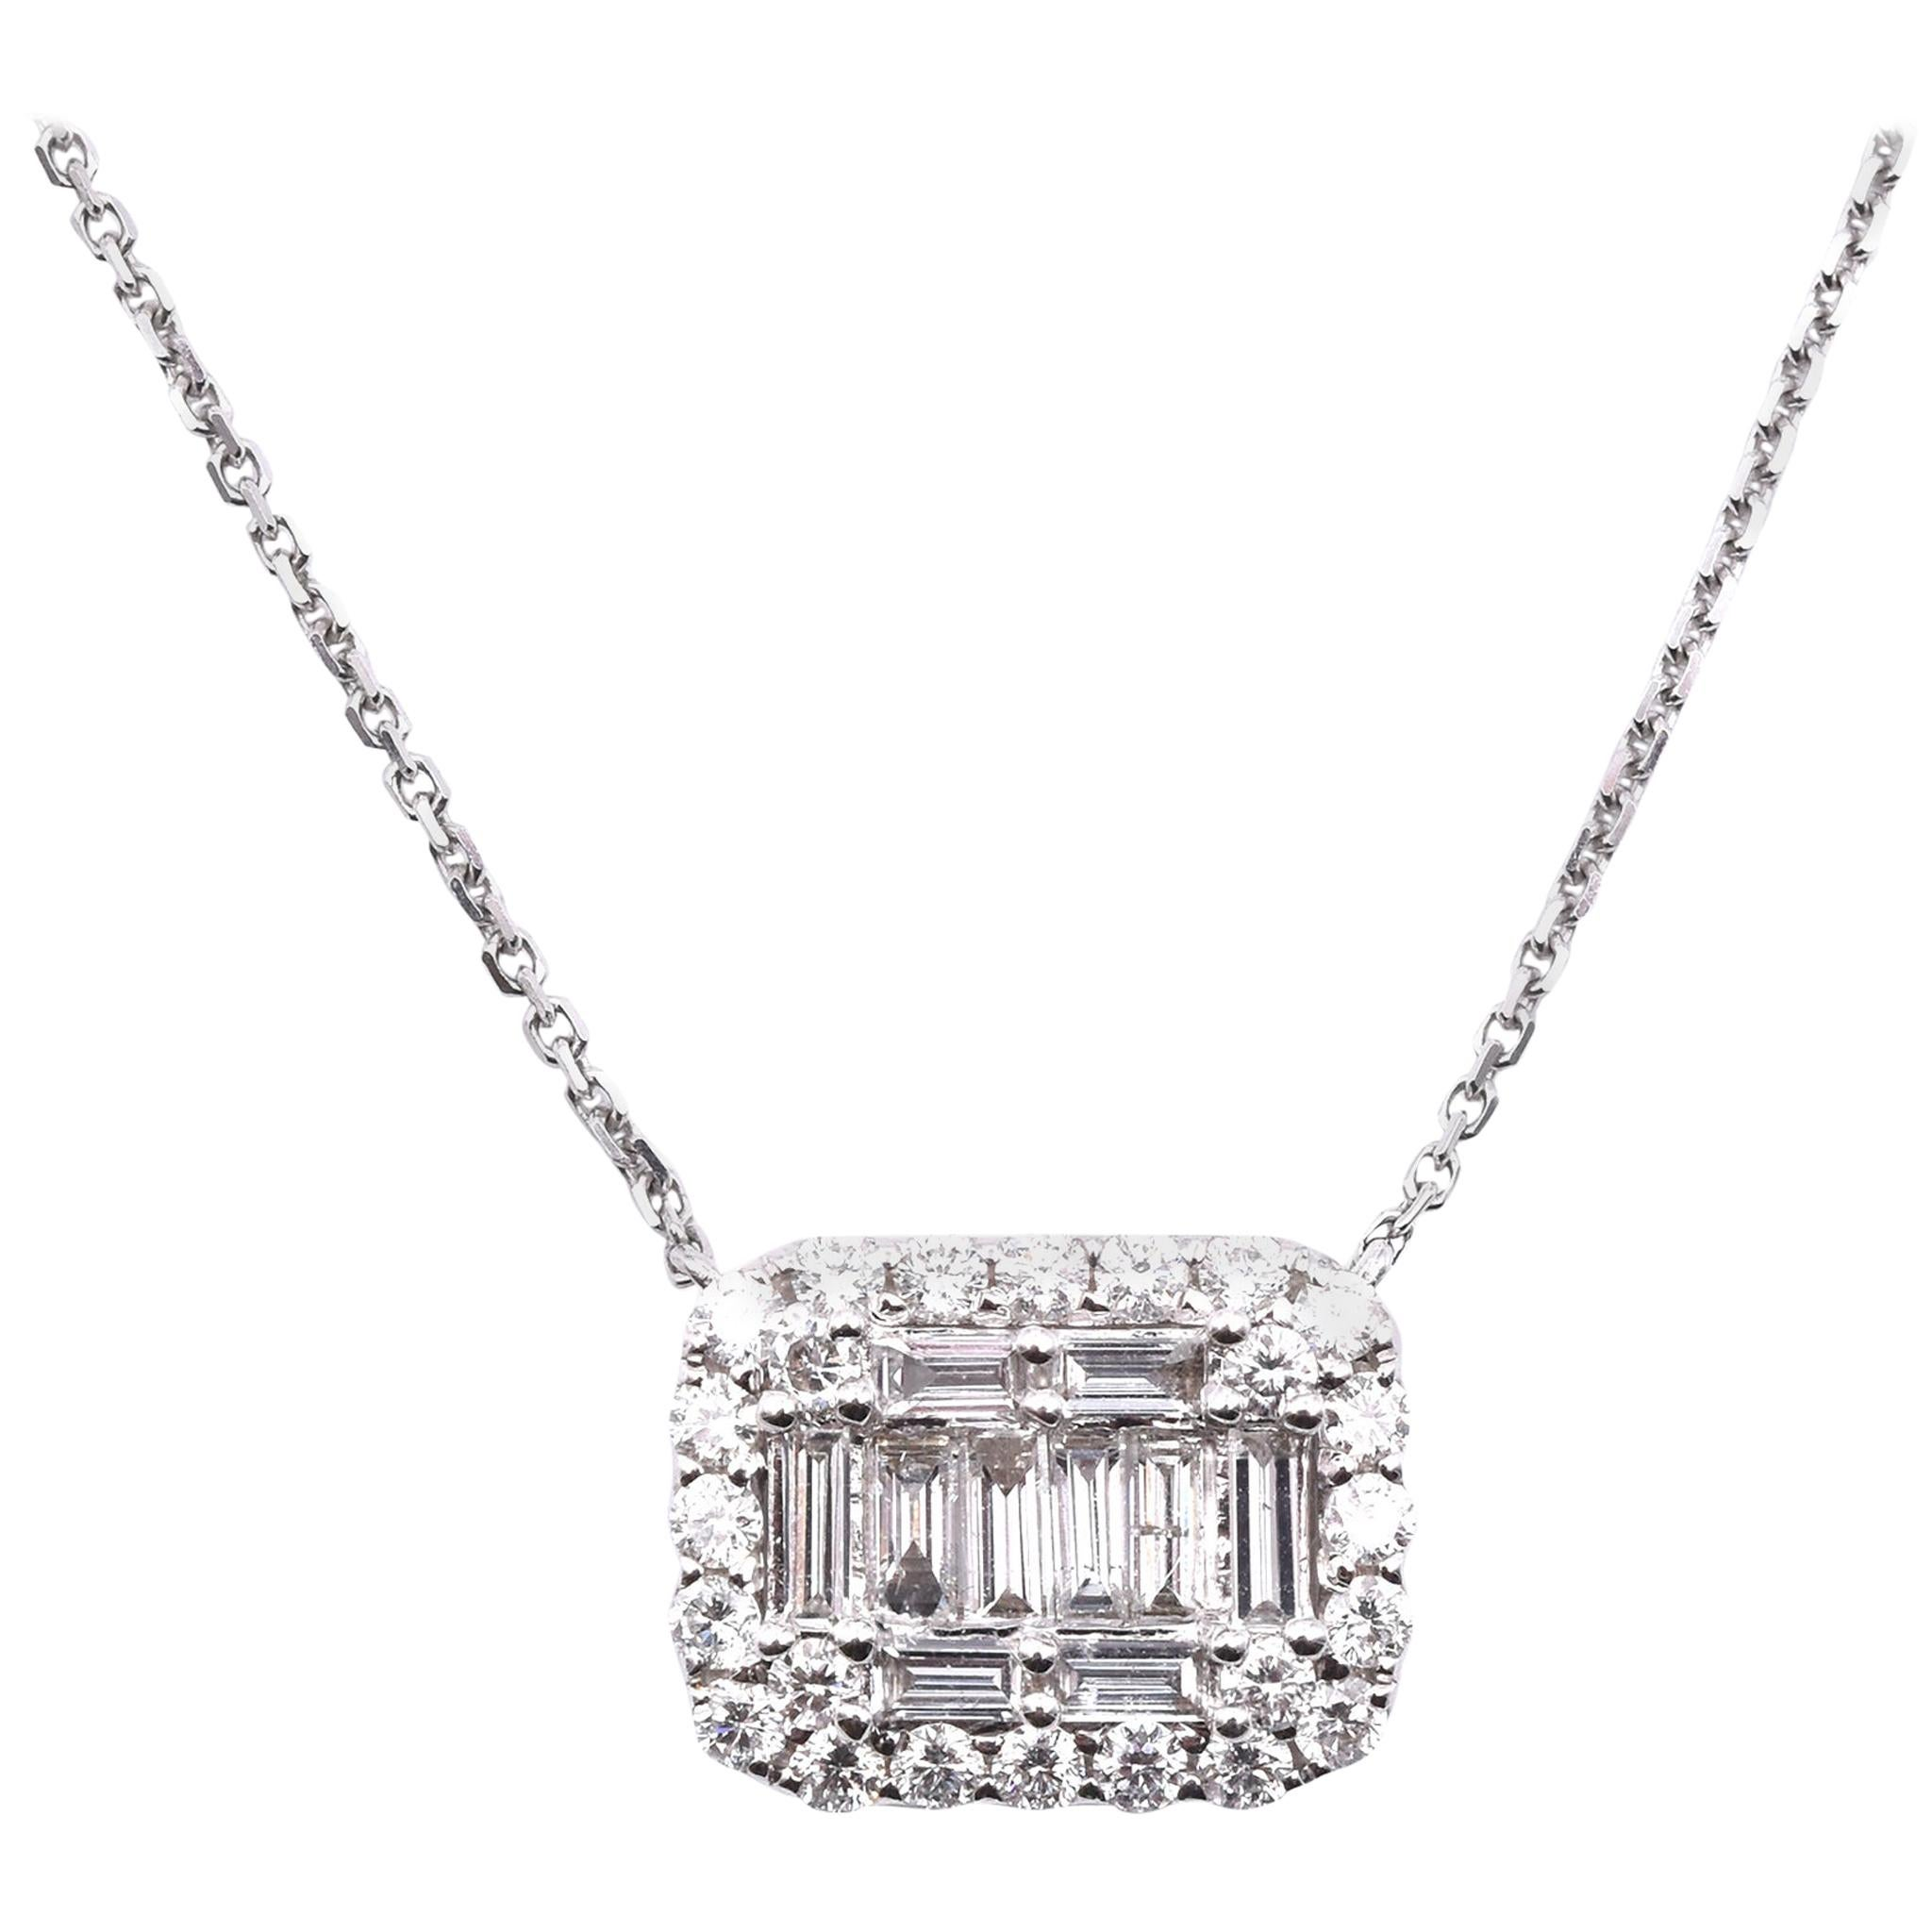 18 Karat White Gold Diamond Mosaic Necklace